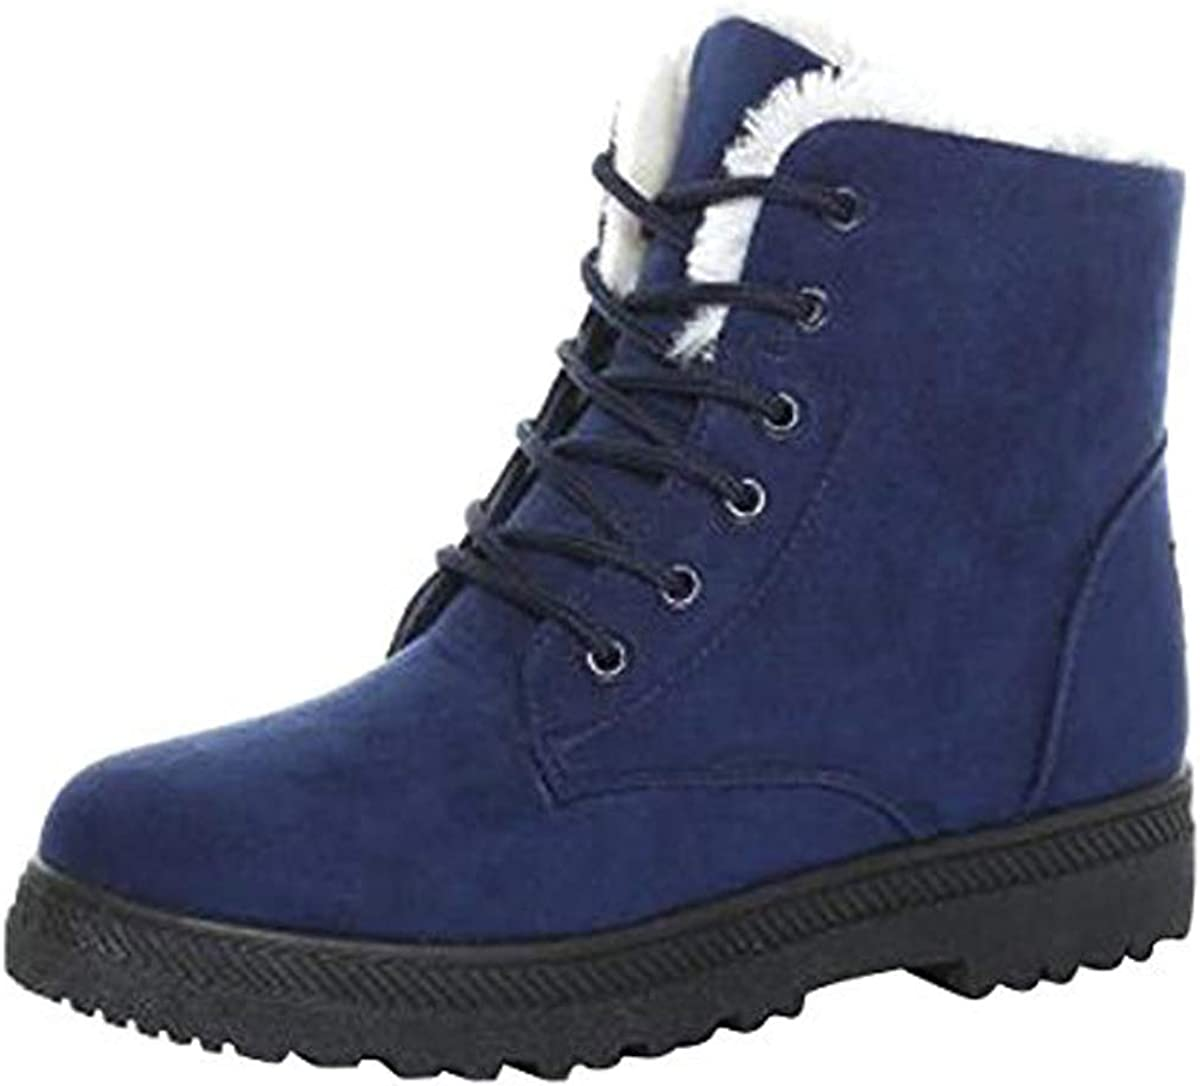 VFDB Velvet Platform Sneaker Boots Winter High Top Lace Up Ankle Snow Boots